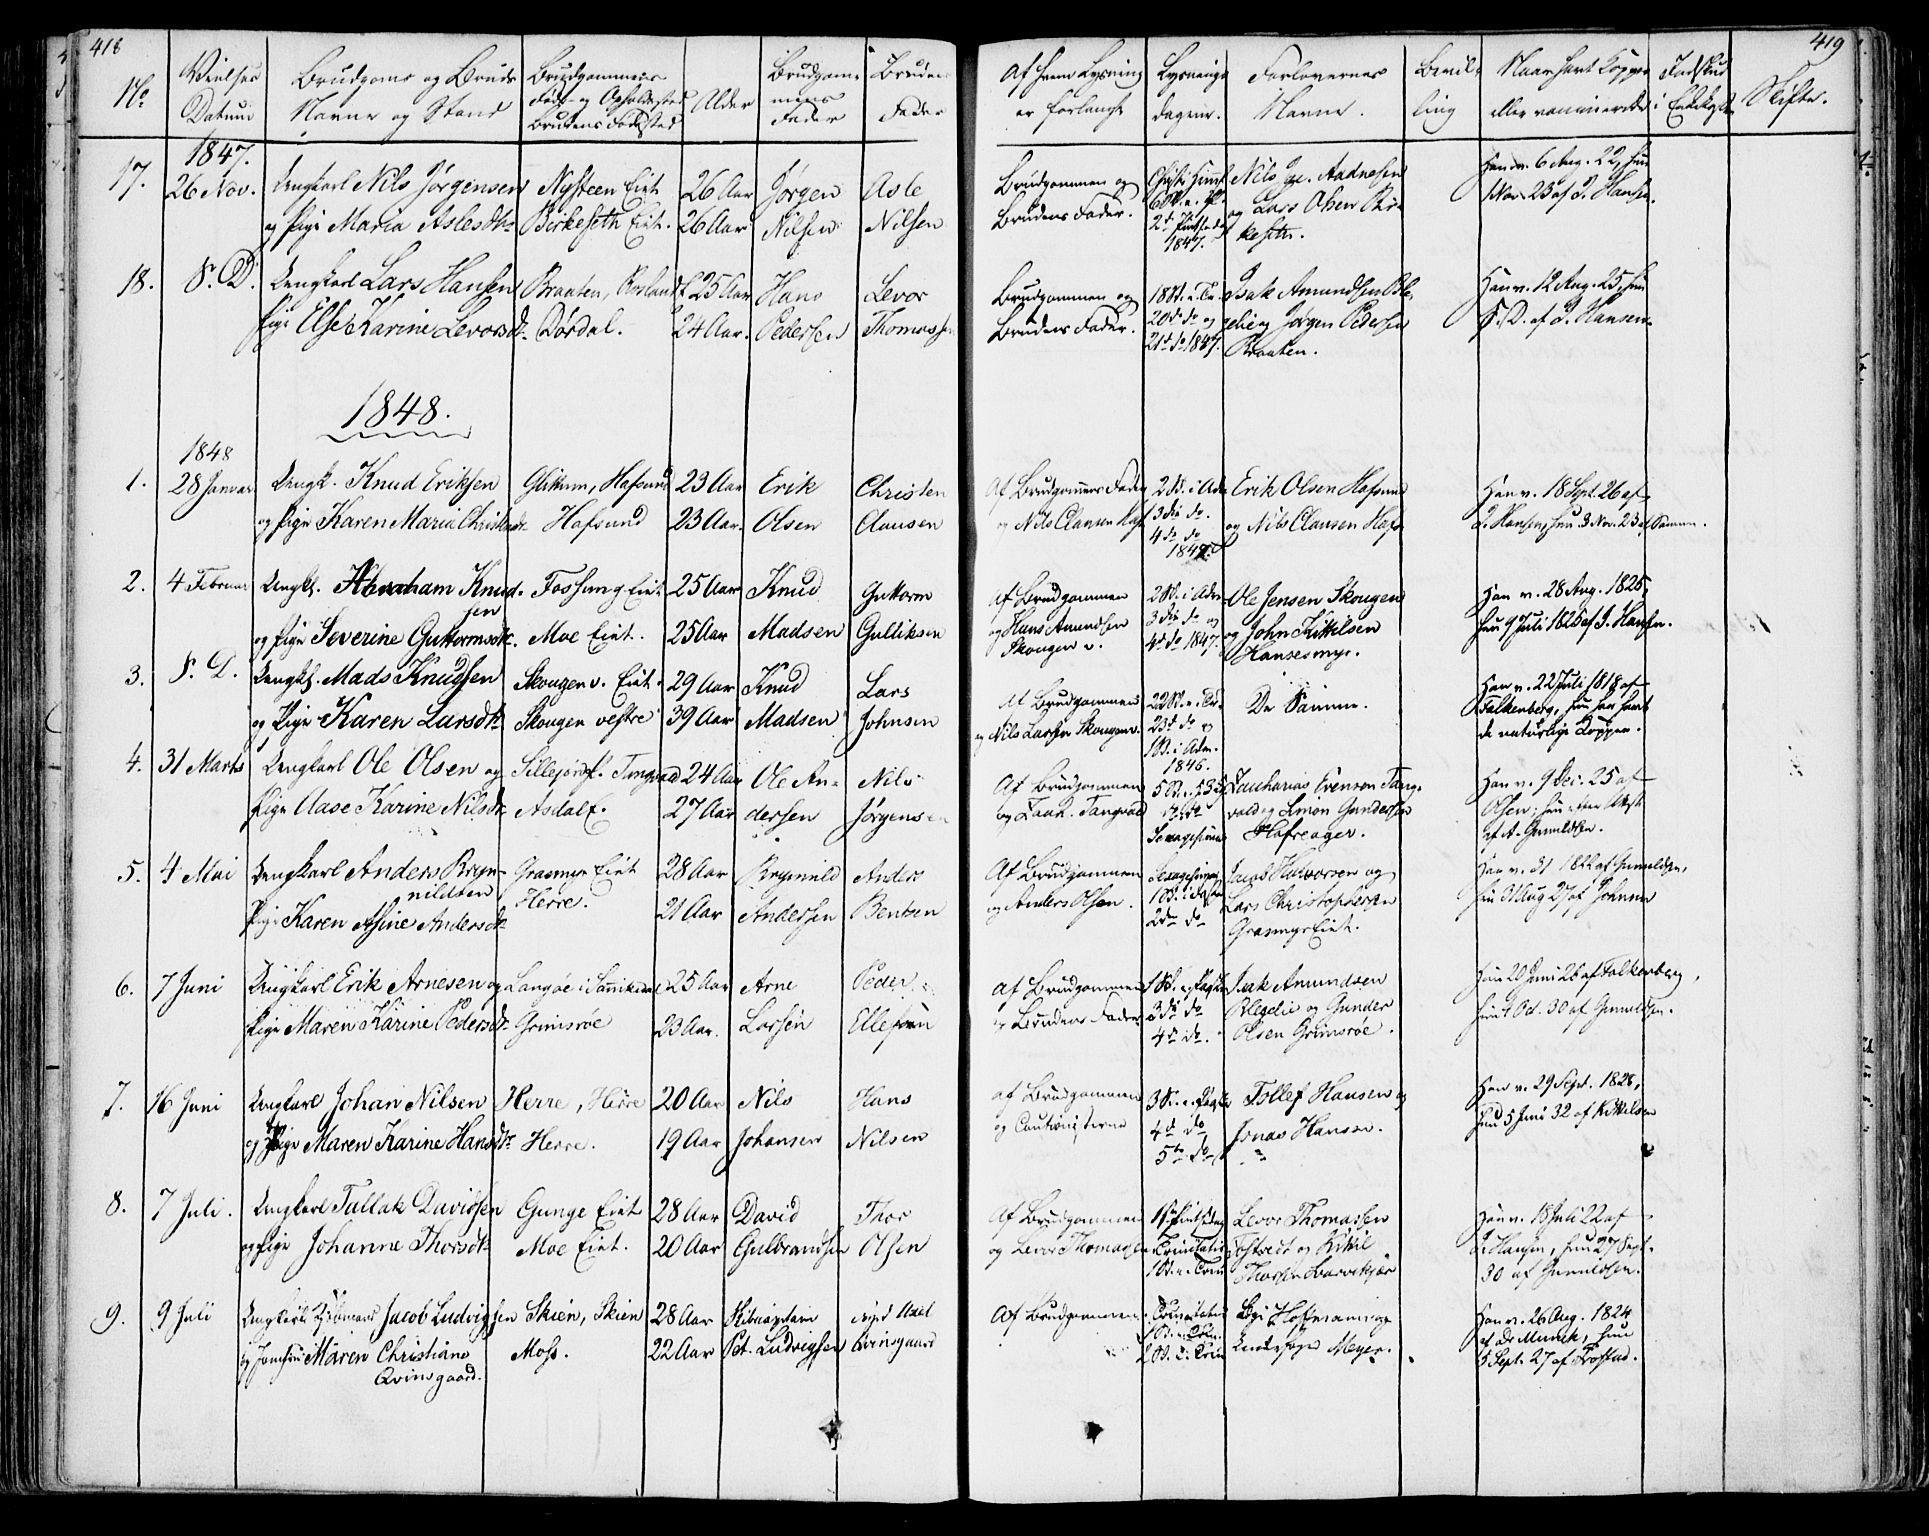 SAKO, Bamble kirkebøker, F/Fa/L0004: Ministerialbok nr. I 4, 1834-1853, s. 418-419